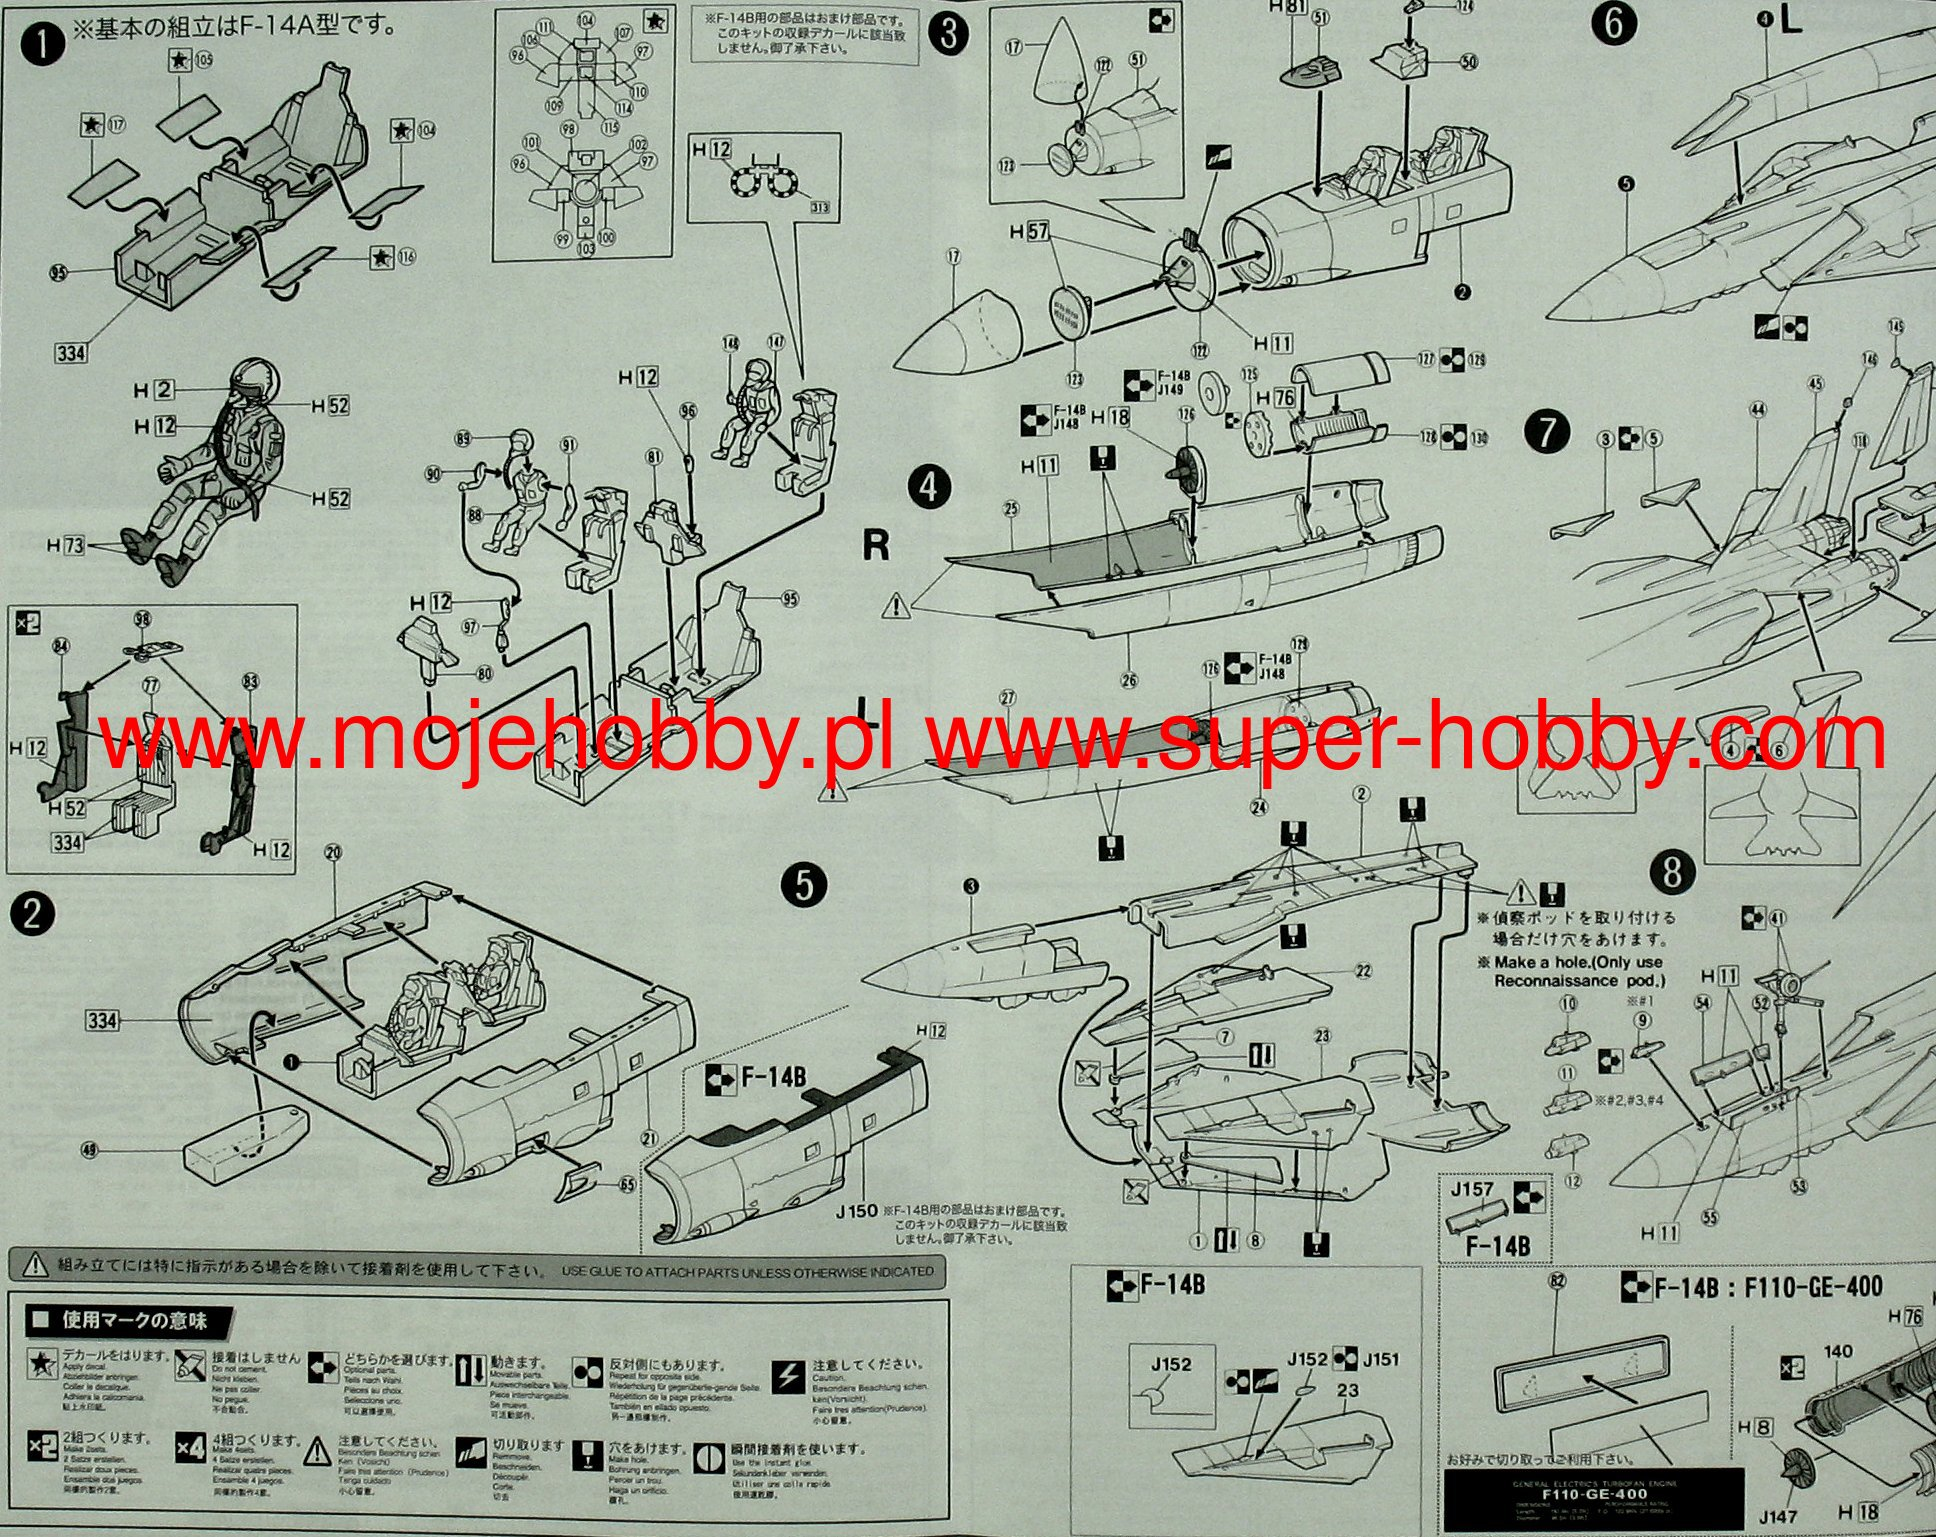 F 14a Tomcat Vf 84 Jolly Rogers Fujimi 722740 Wiring Diagram Hornet 740t 2 Fjm722740